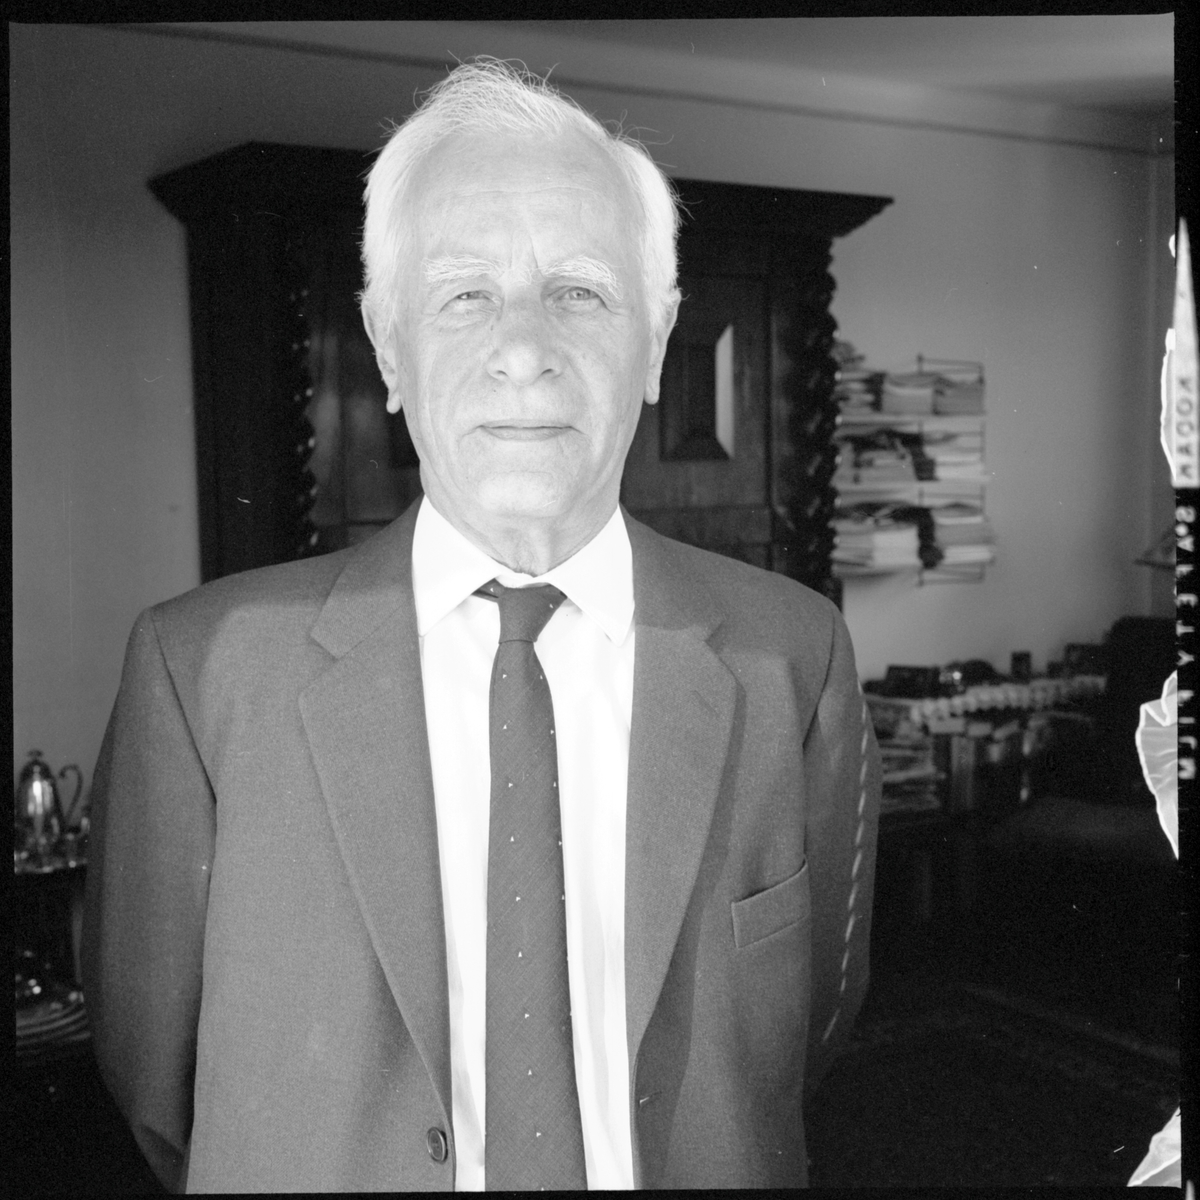 Förste Trafikinspektör (Fti) Erik Enhage